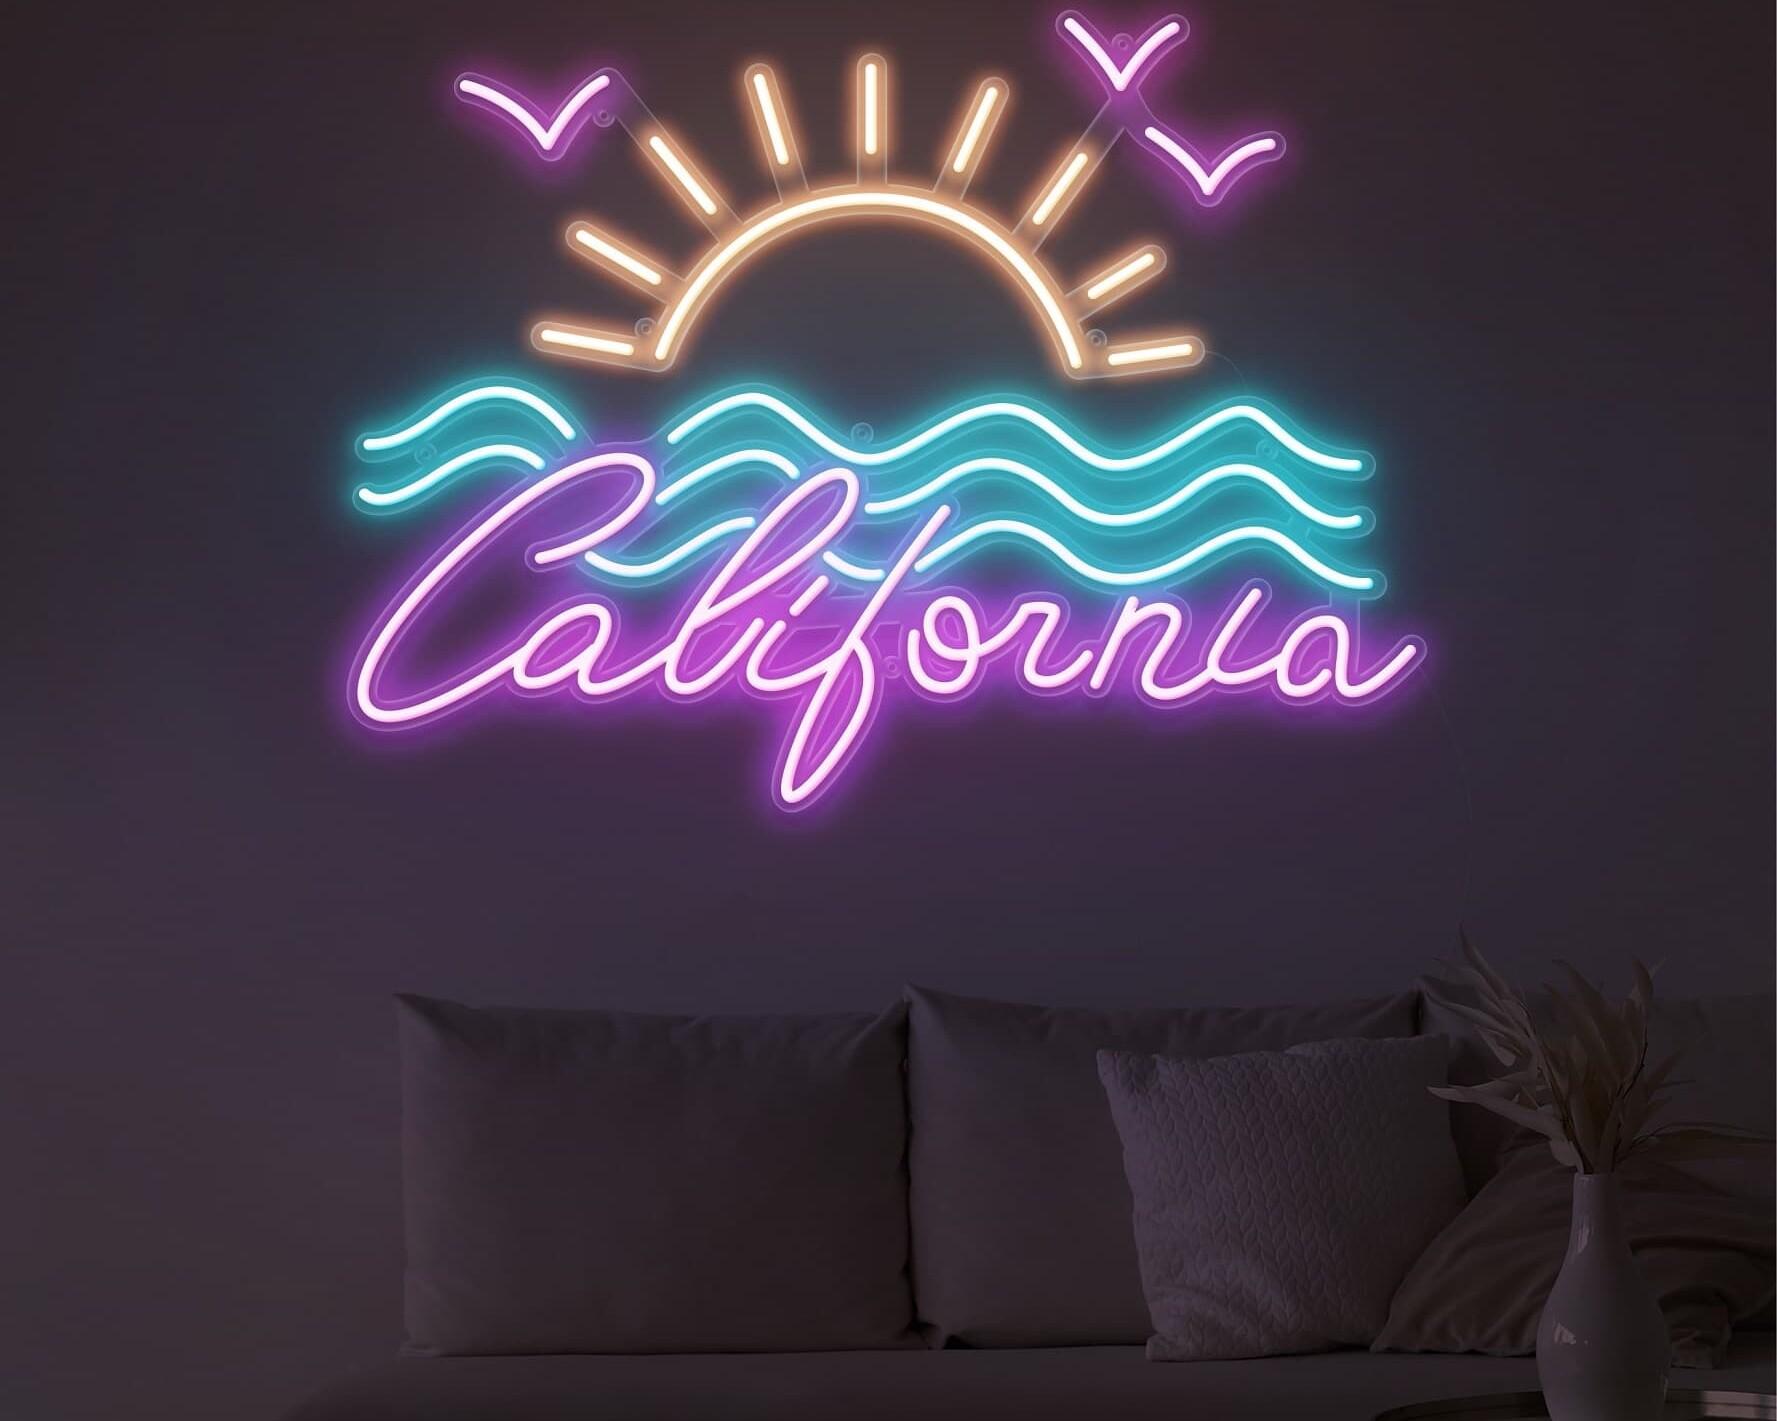 california sunrise neon light